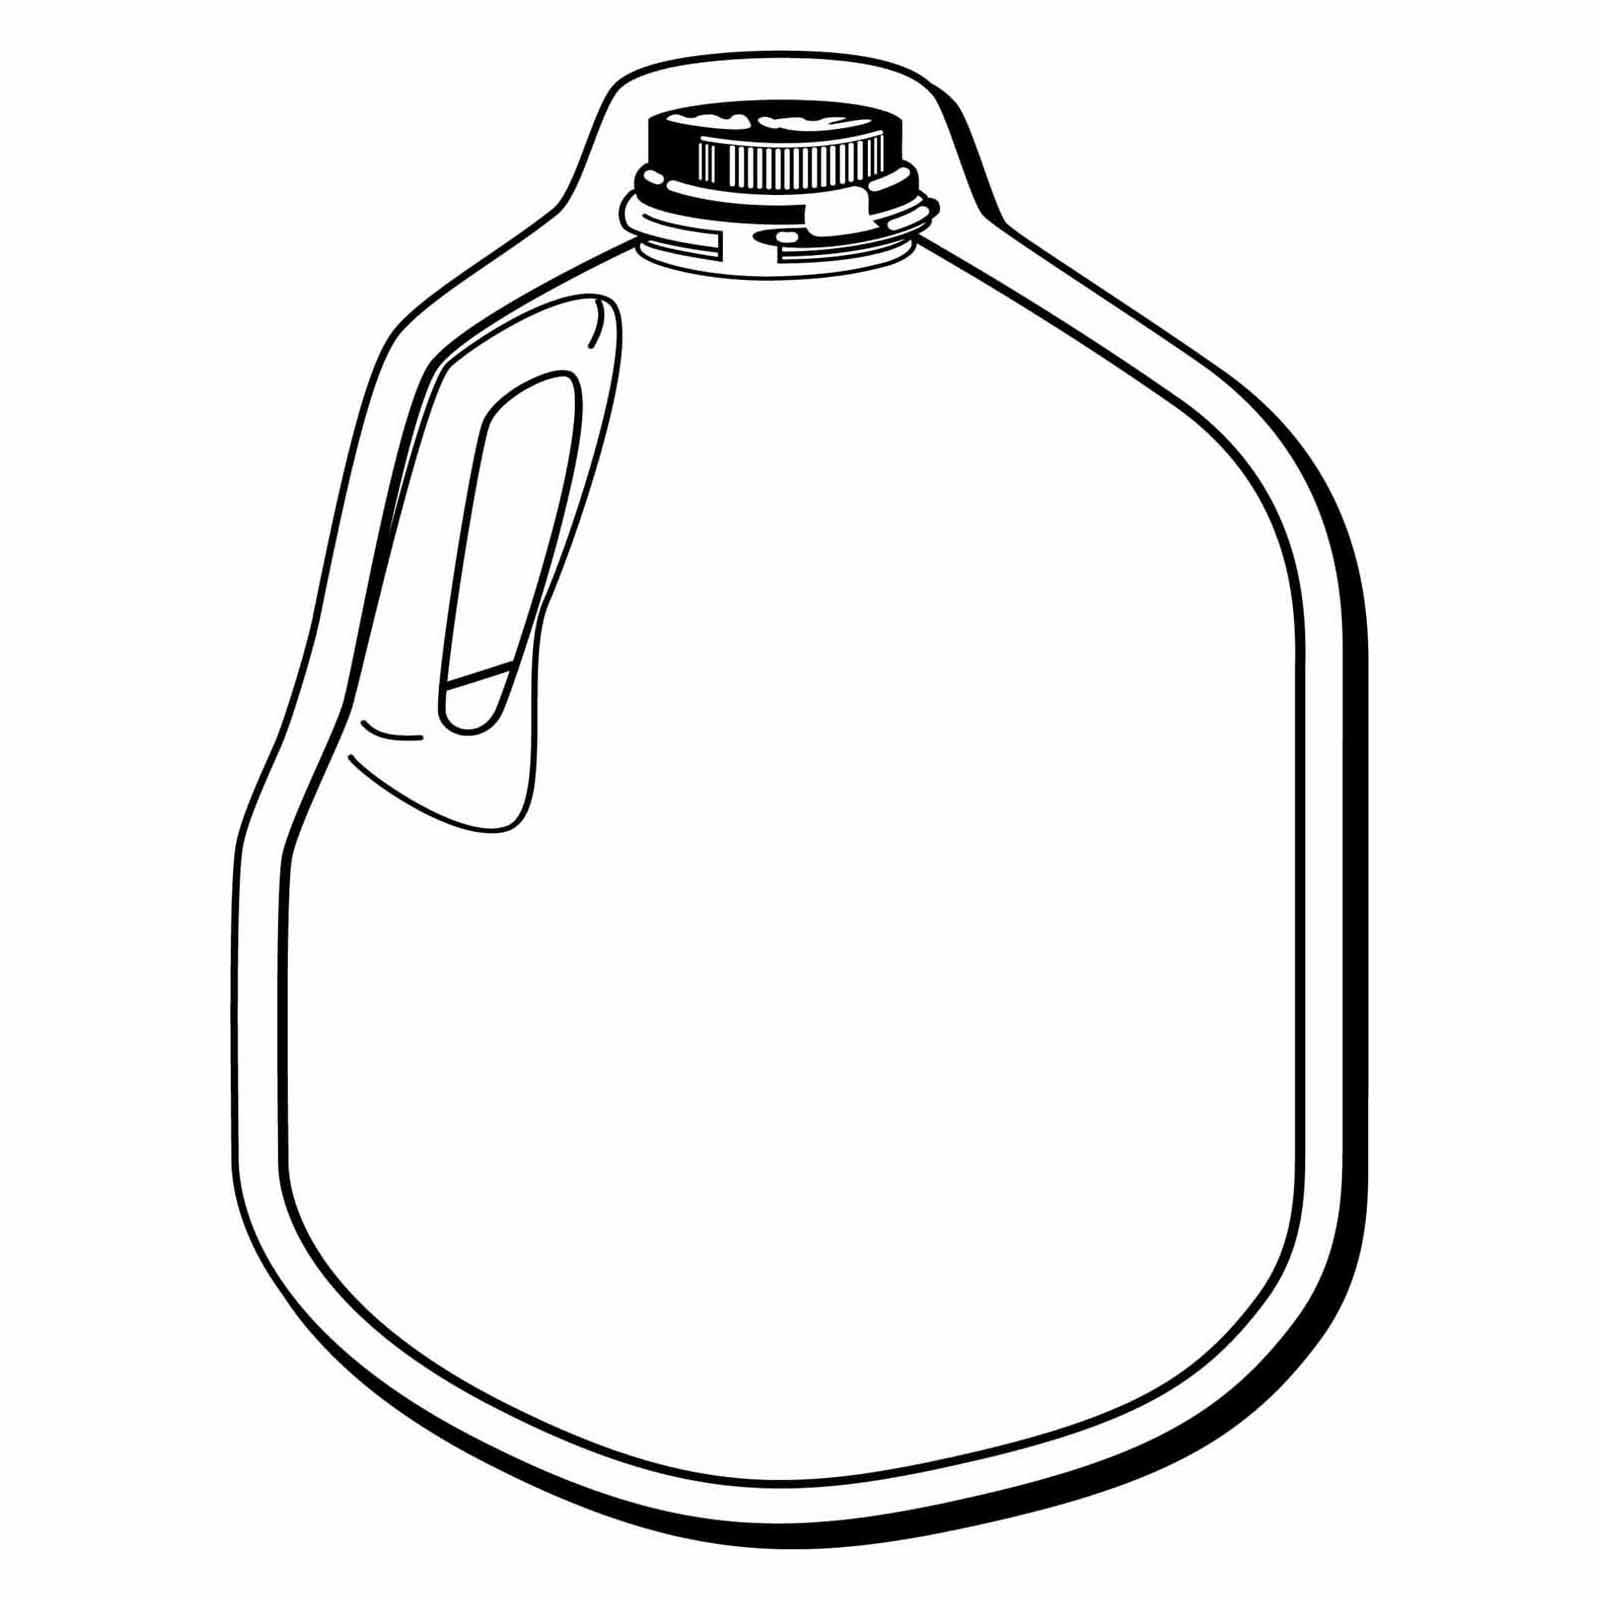 Free Cliparts Gallon Jug, Download Free Clip Art, Free Clip.